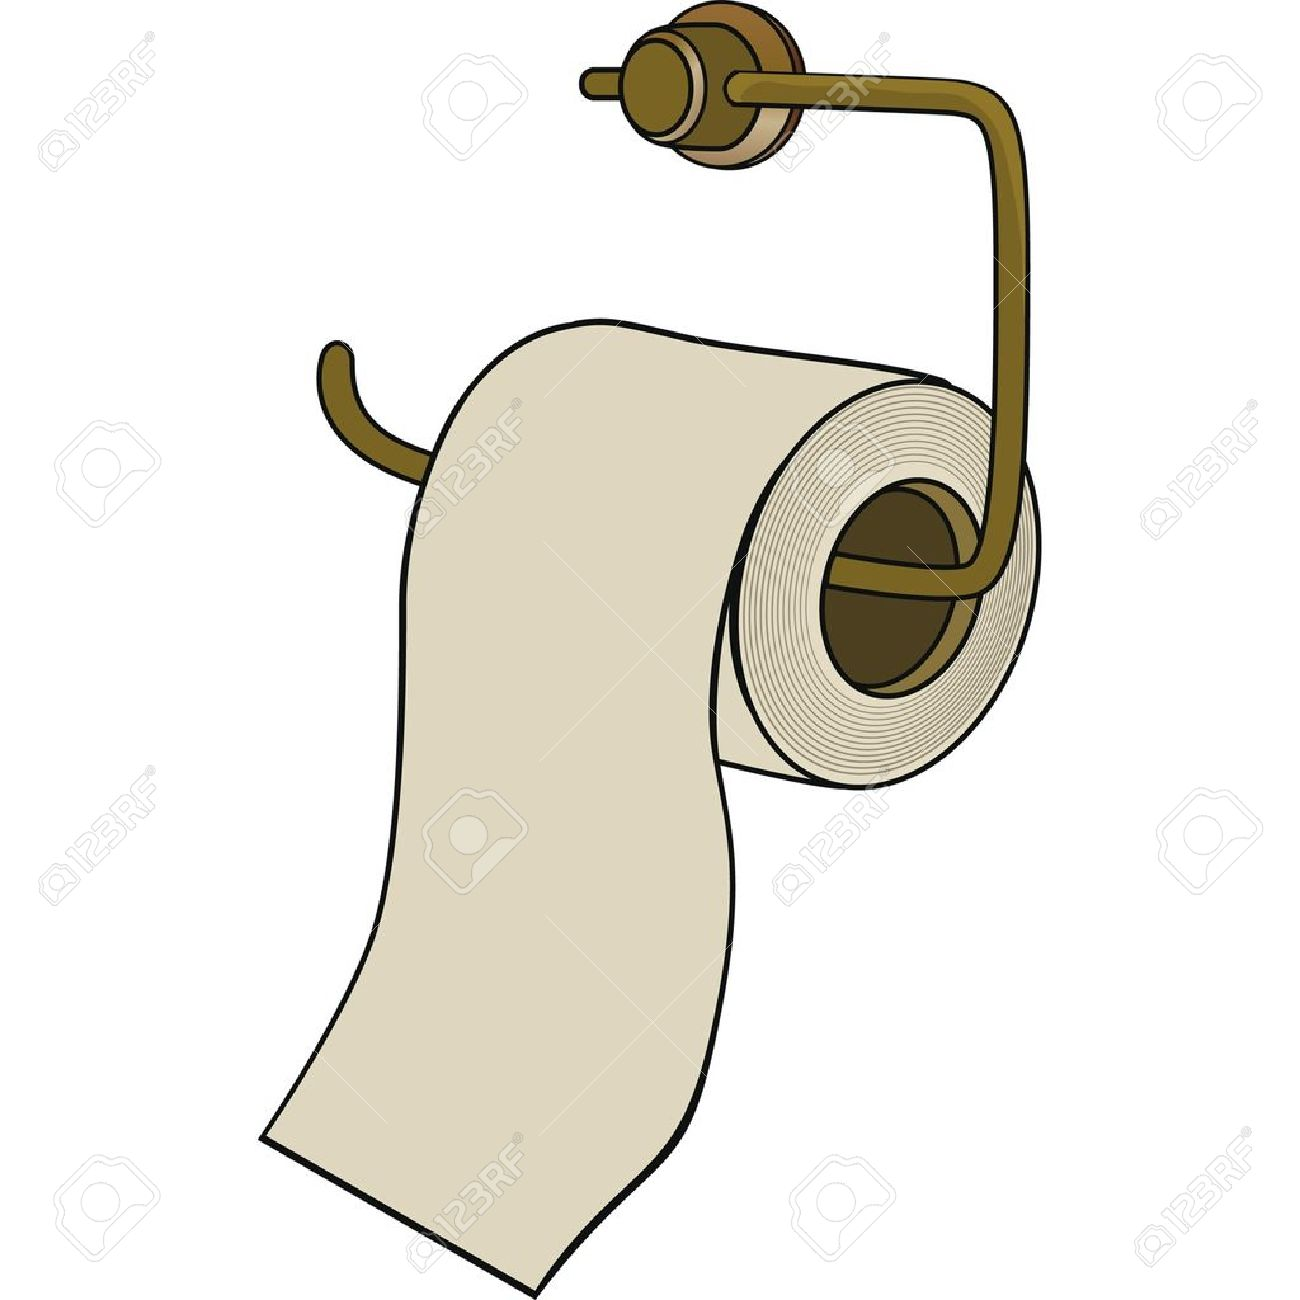 1300x1300 Toilet Clipart Toilet Roll